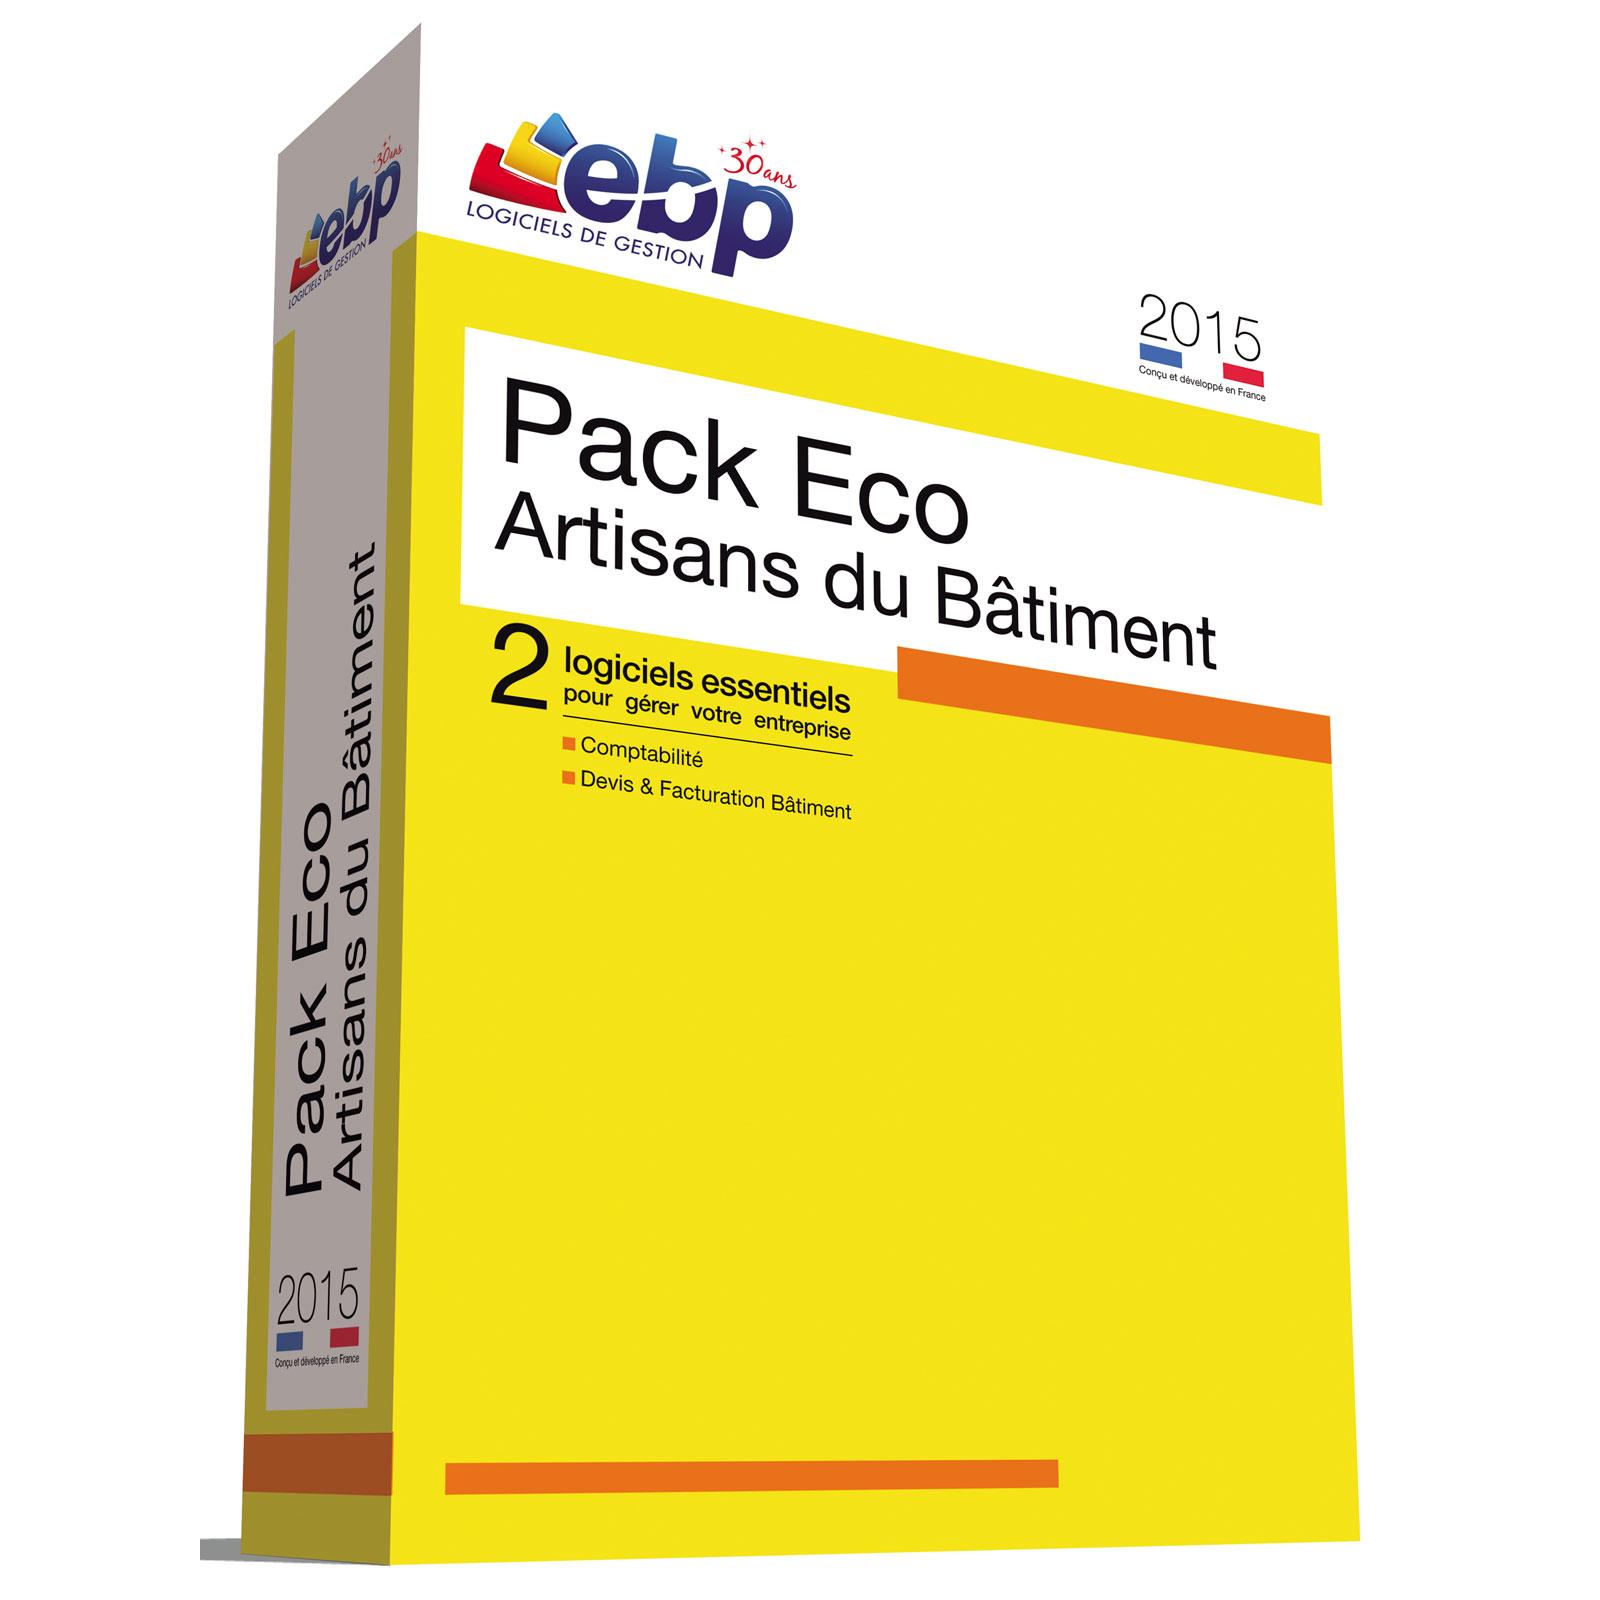 ebp pack eco artisans du b timent 2015 logiciel comptabilit gestion ebp sur. Black Bedroom Furniture Sets. Home Design Ideas